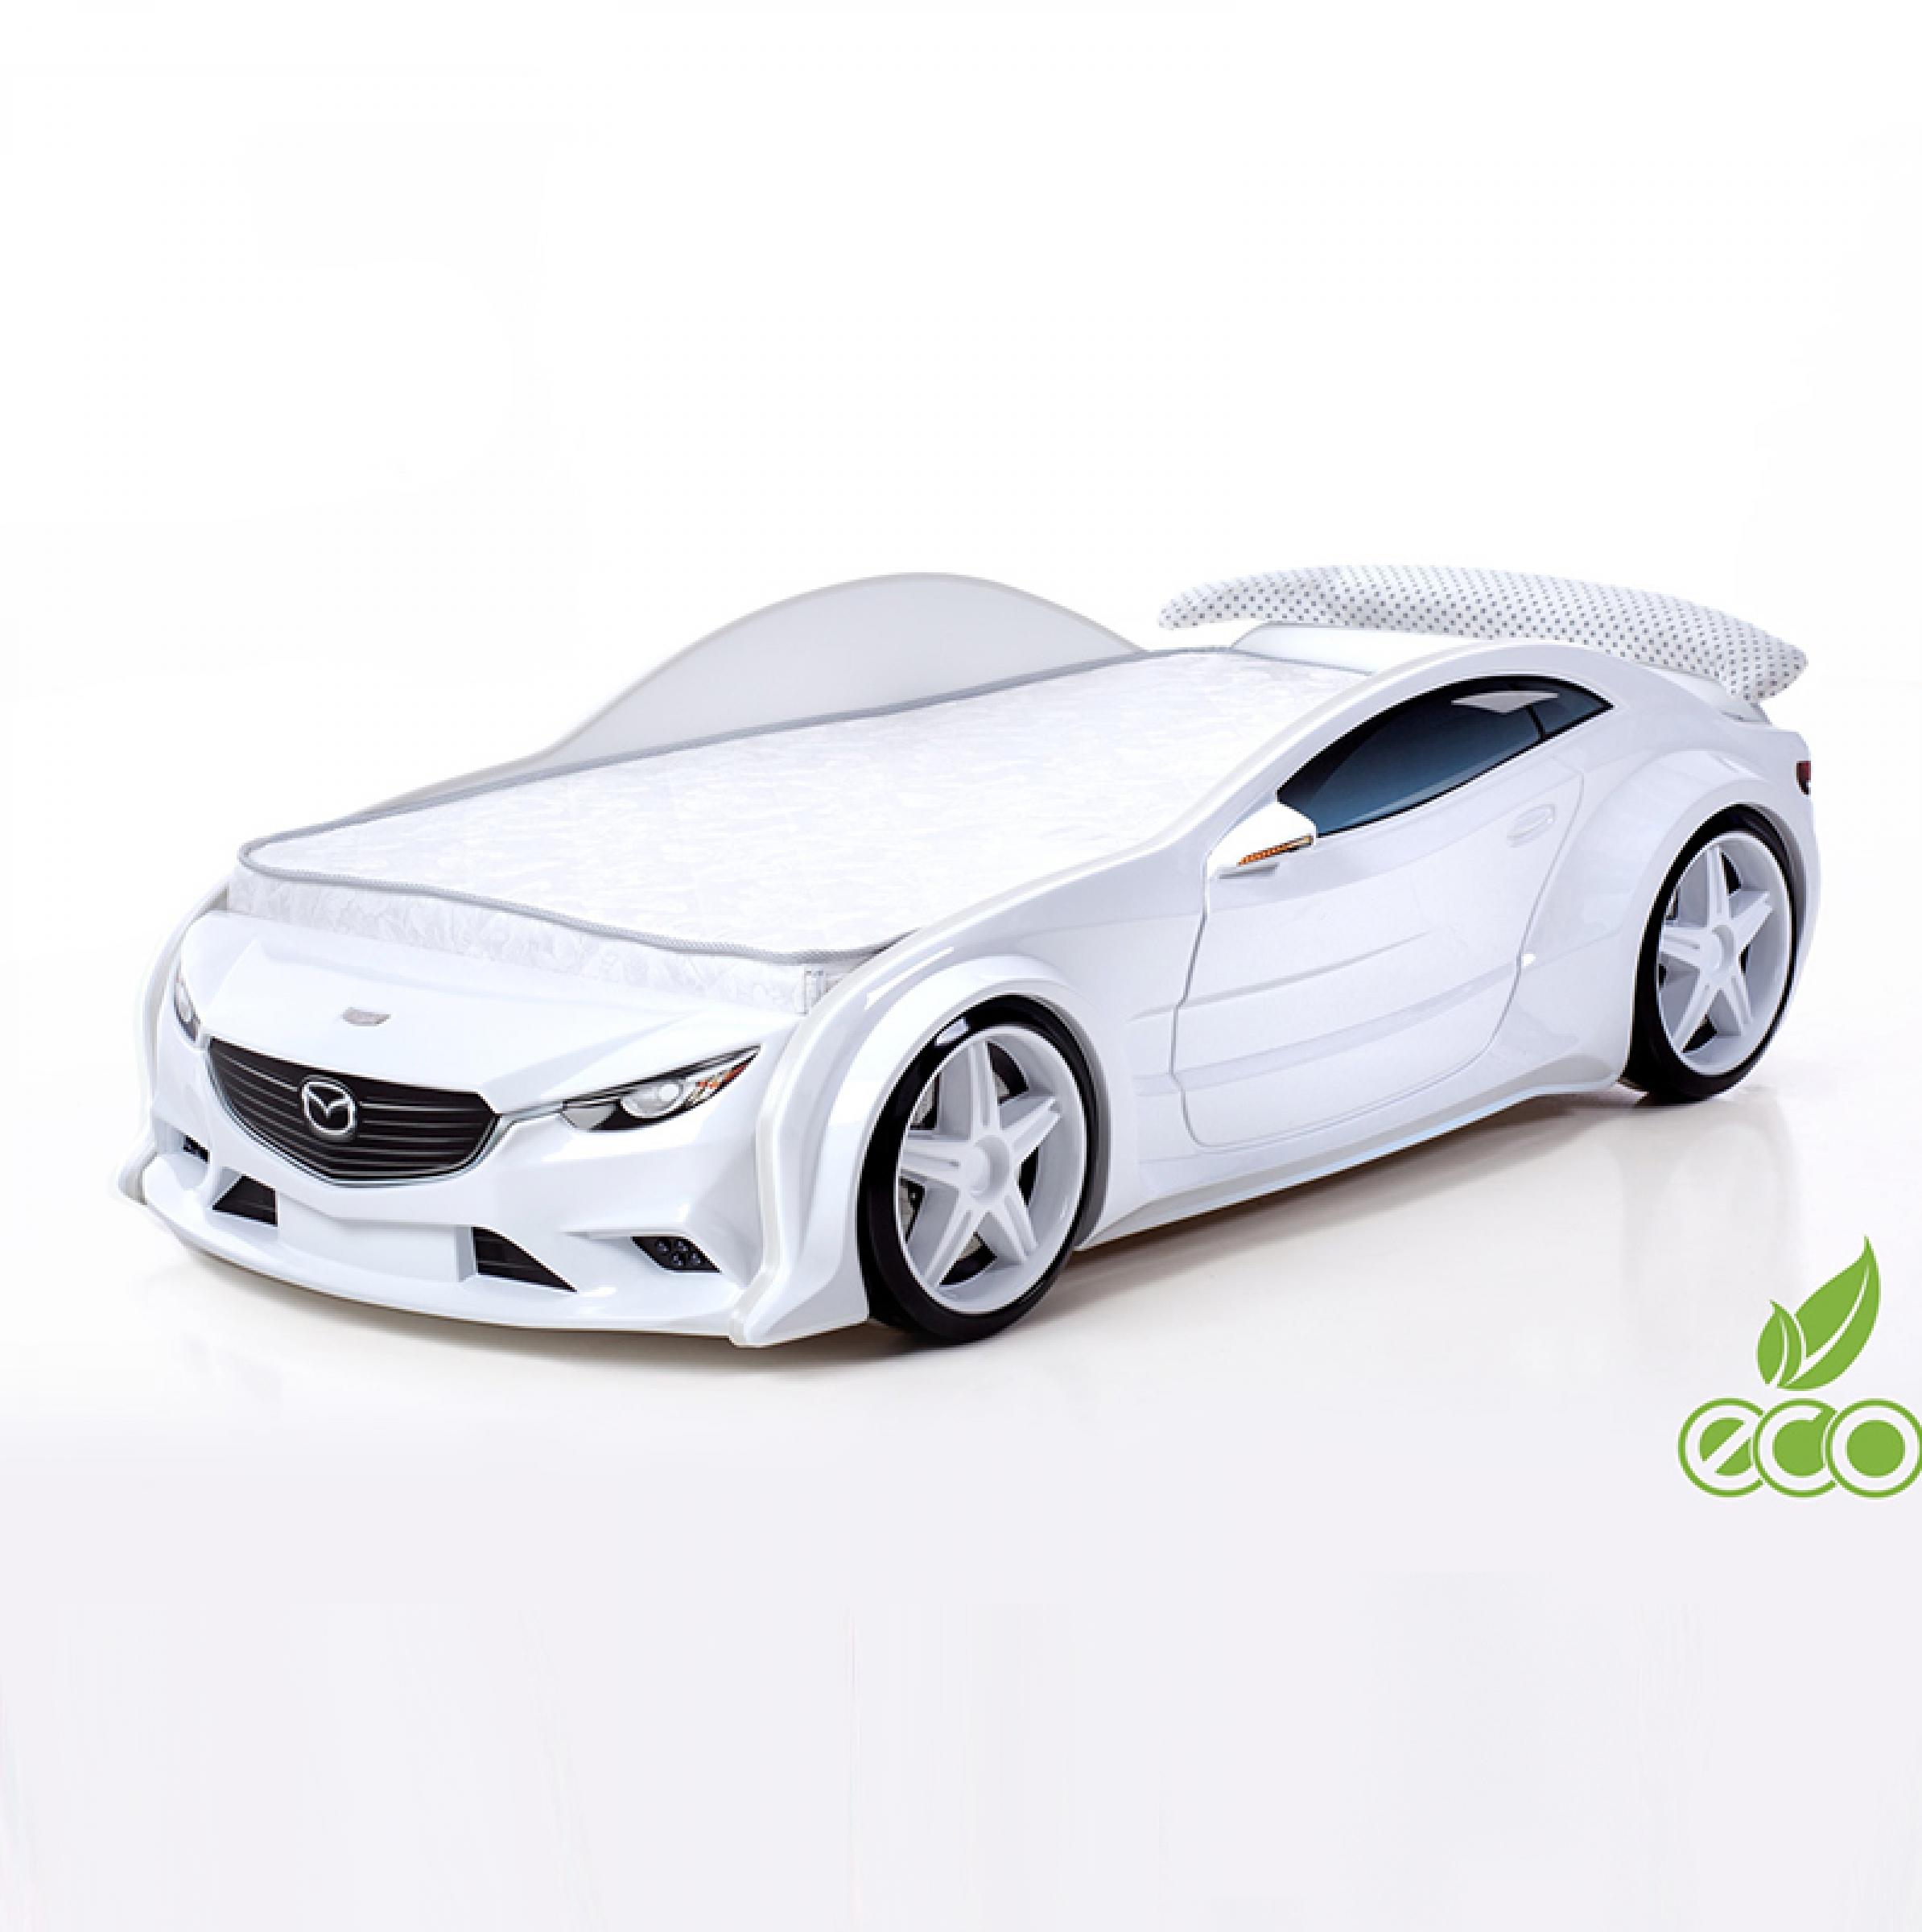 Futuka Kids кровать-машина Мазда-EVO (белый)